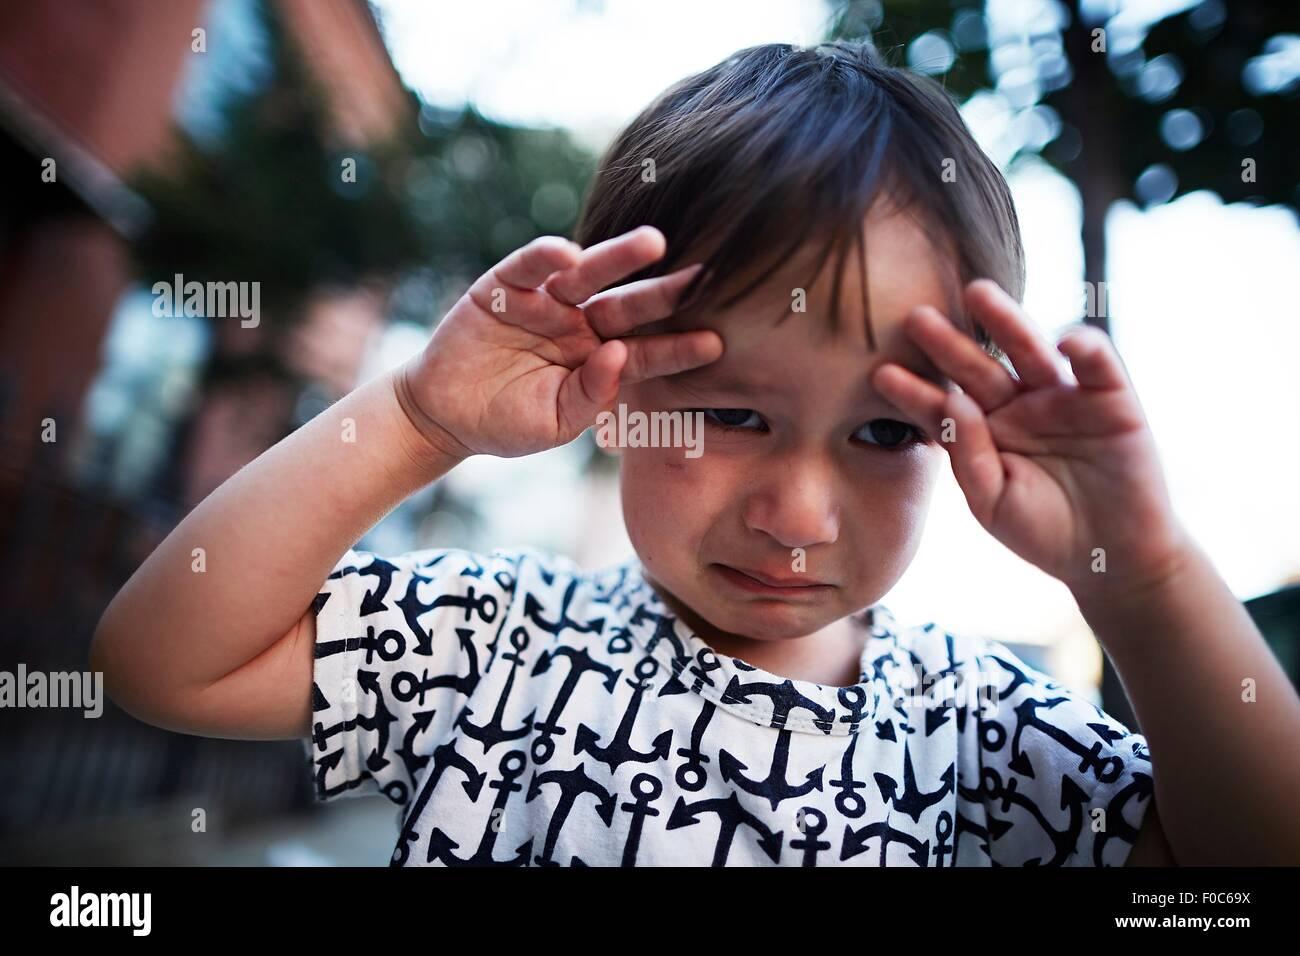 Portrait of boy crying on street Photo Stock